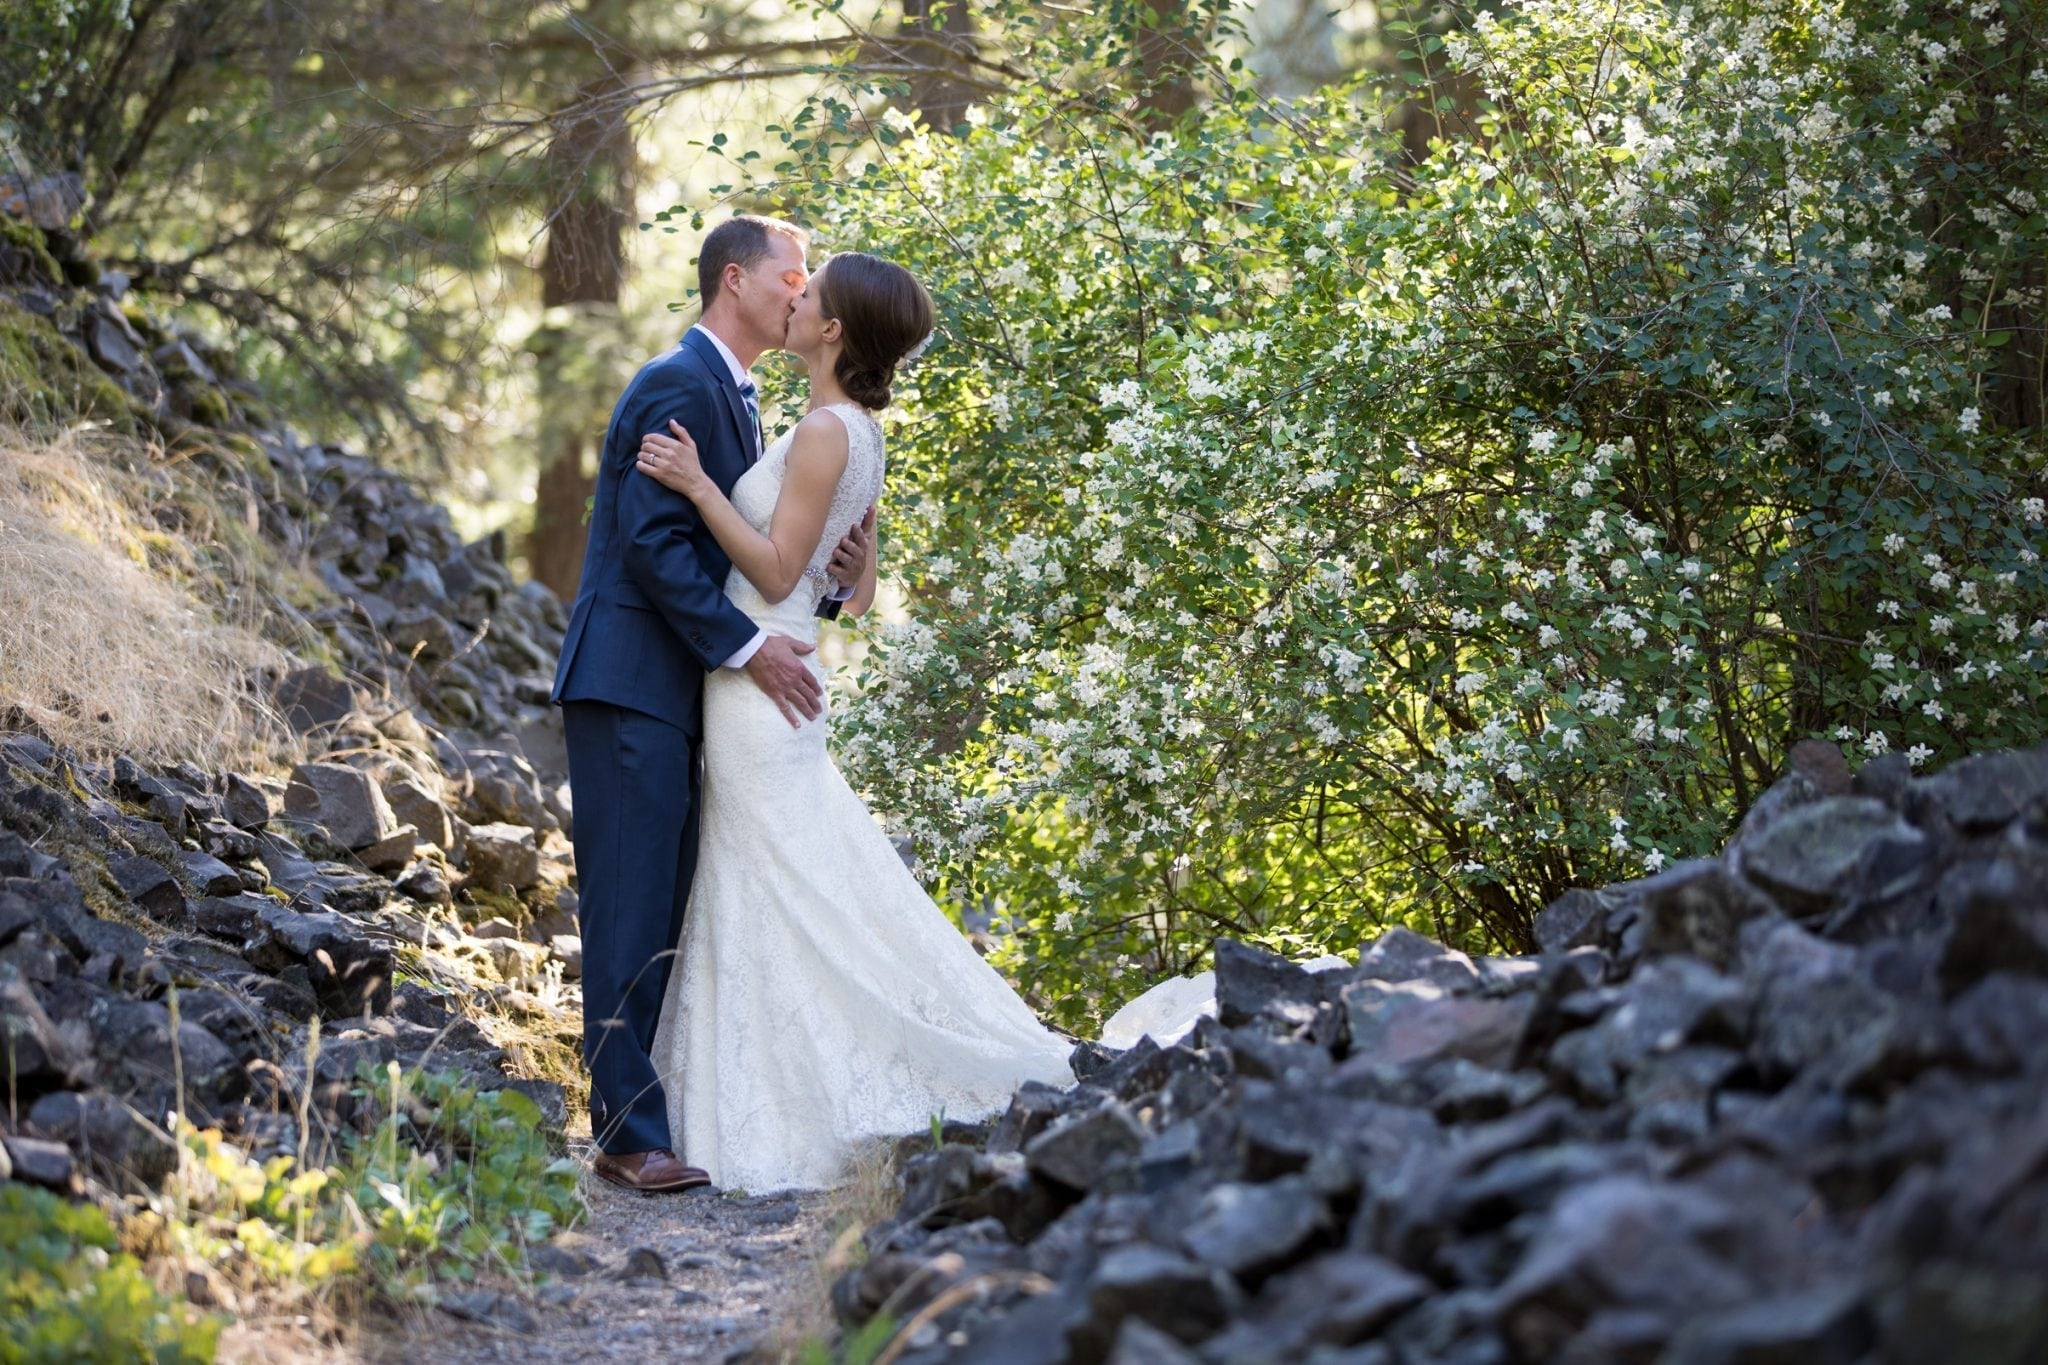 Wedding Photography by Franklin Photography in Spokane WA